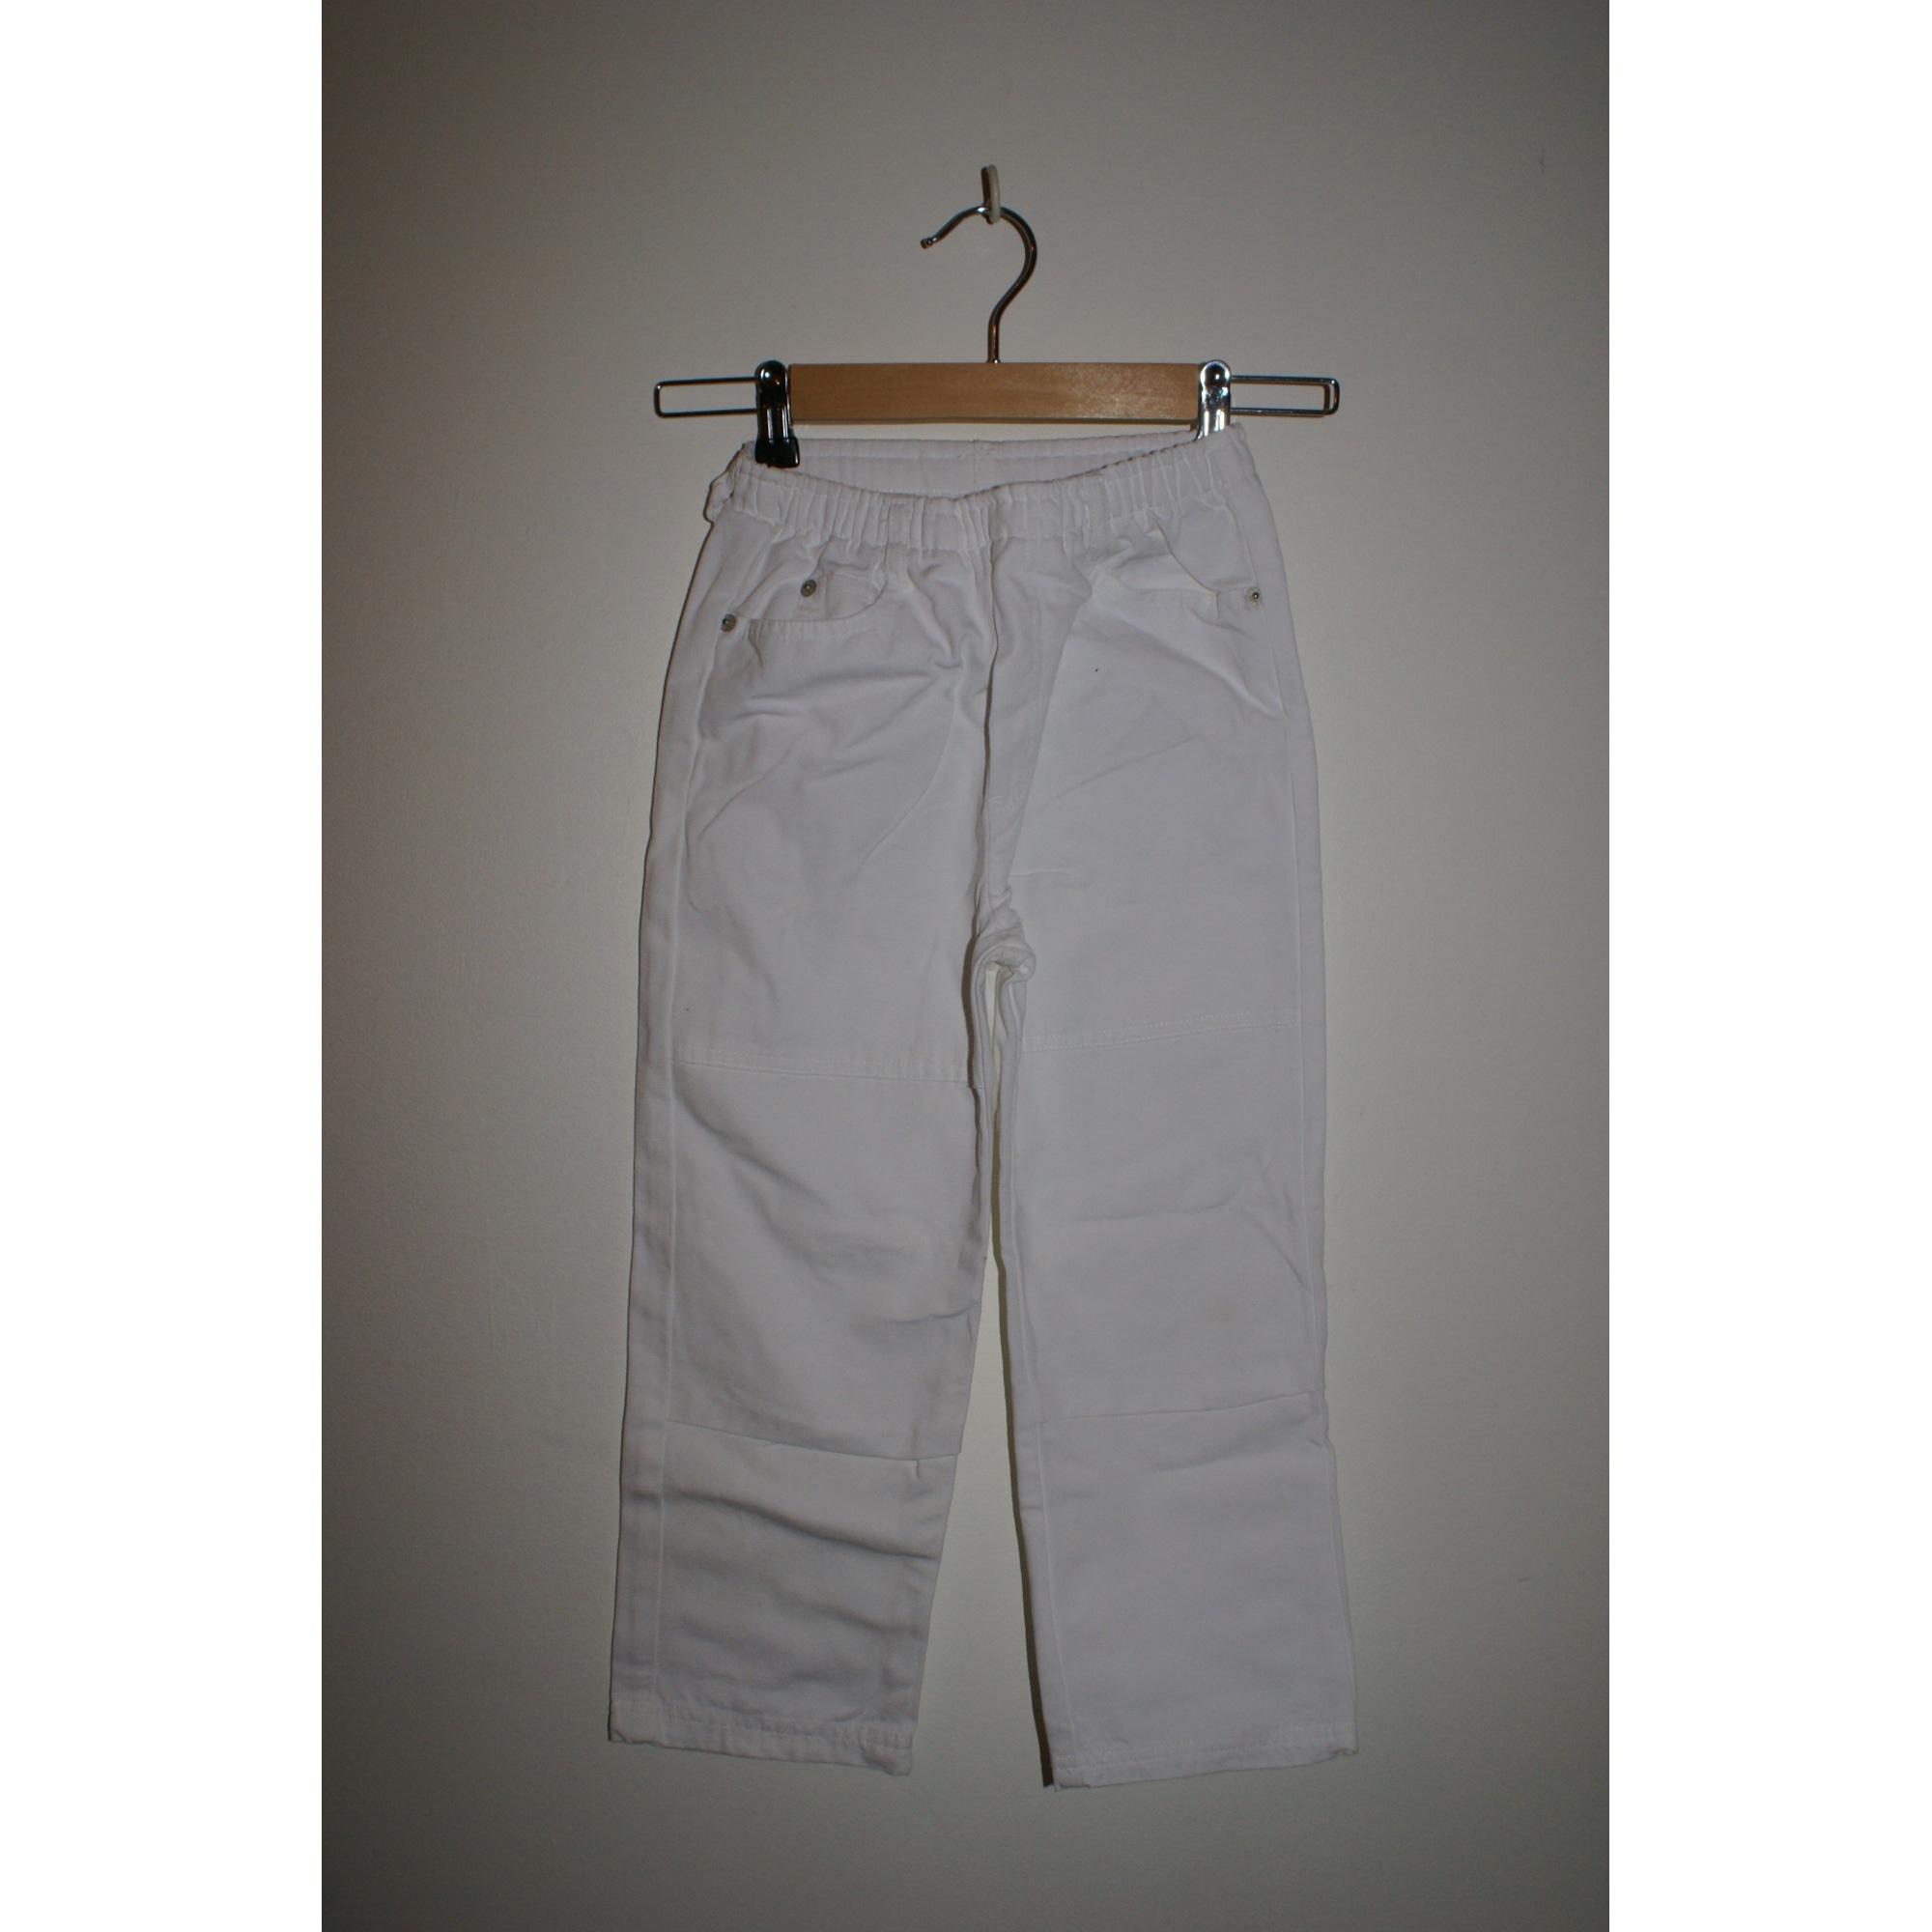 Pantalon 3 POMMES Blanc, blanc cassé, écru